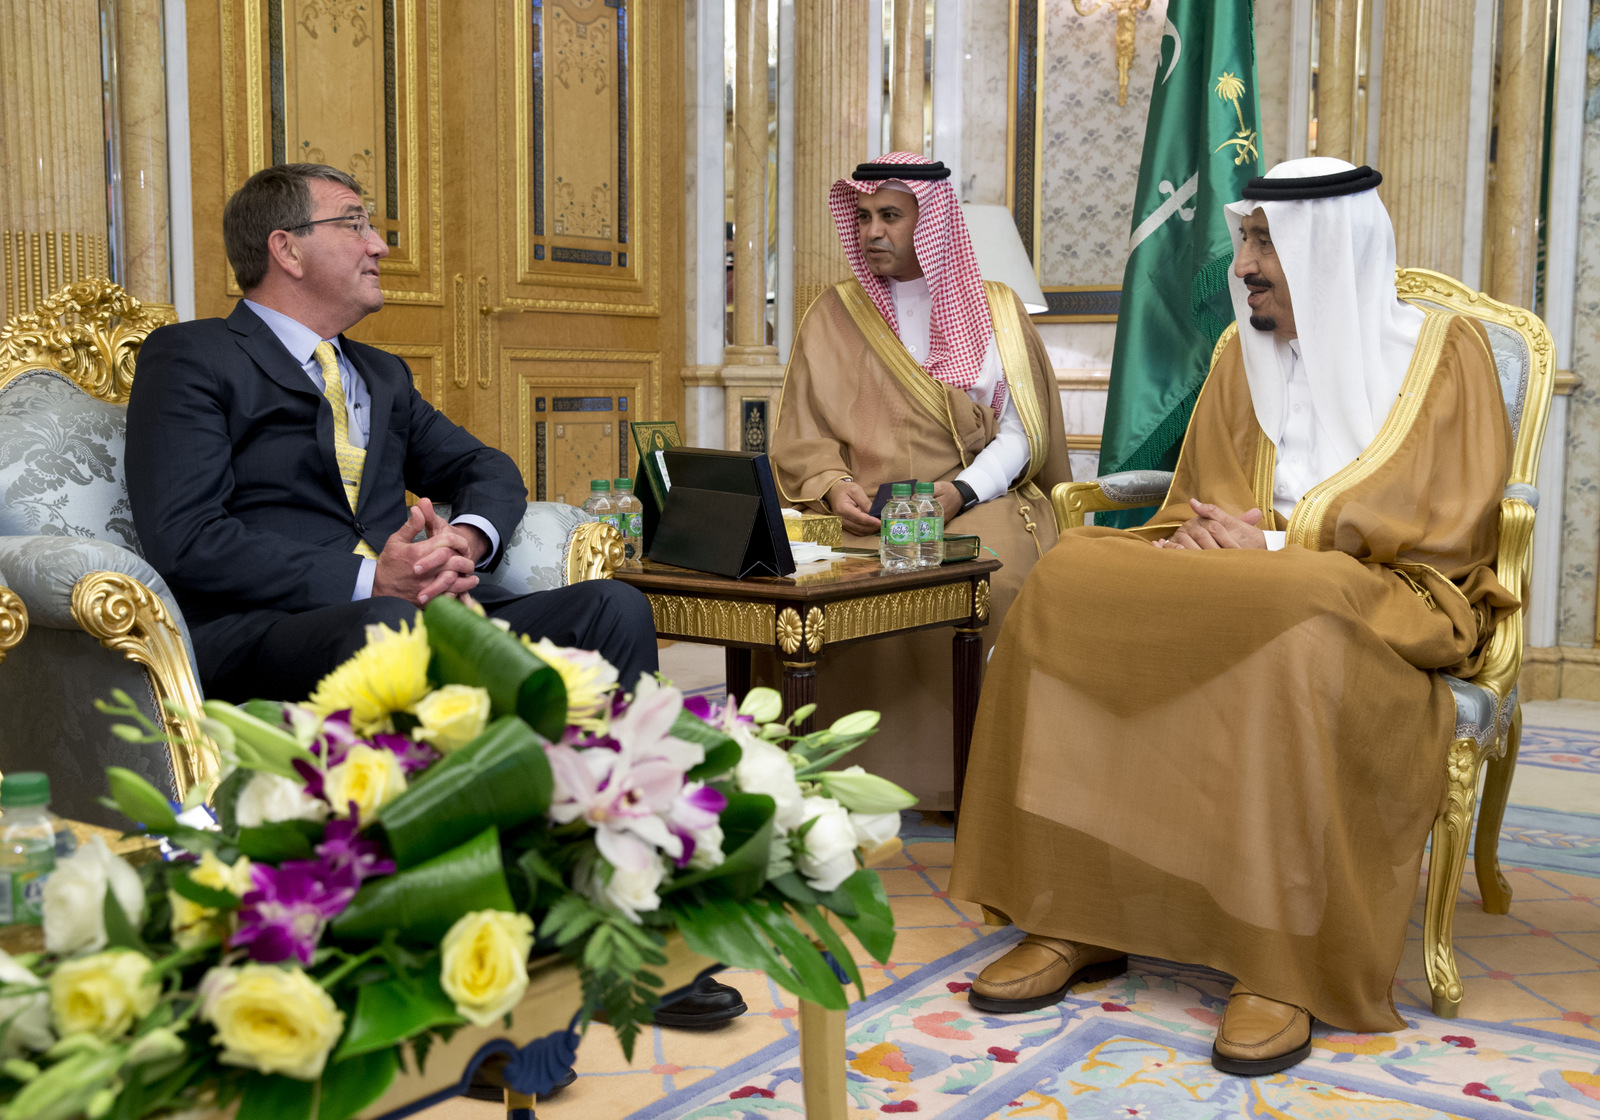 U.S. Defense Secretary Ash Carter, left, meets with Saudi Arabian King Salman bin Abdul Aziz, right, at Al-Salam Palace in Jiddah, Saudi Arabia, Wednesday, July 22, 2015.(AP Photo/Carolyn Kaster, Pool)